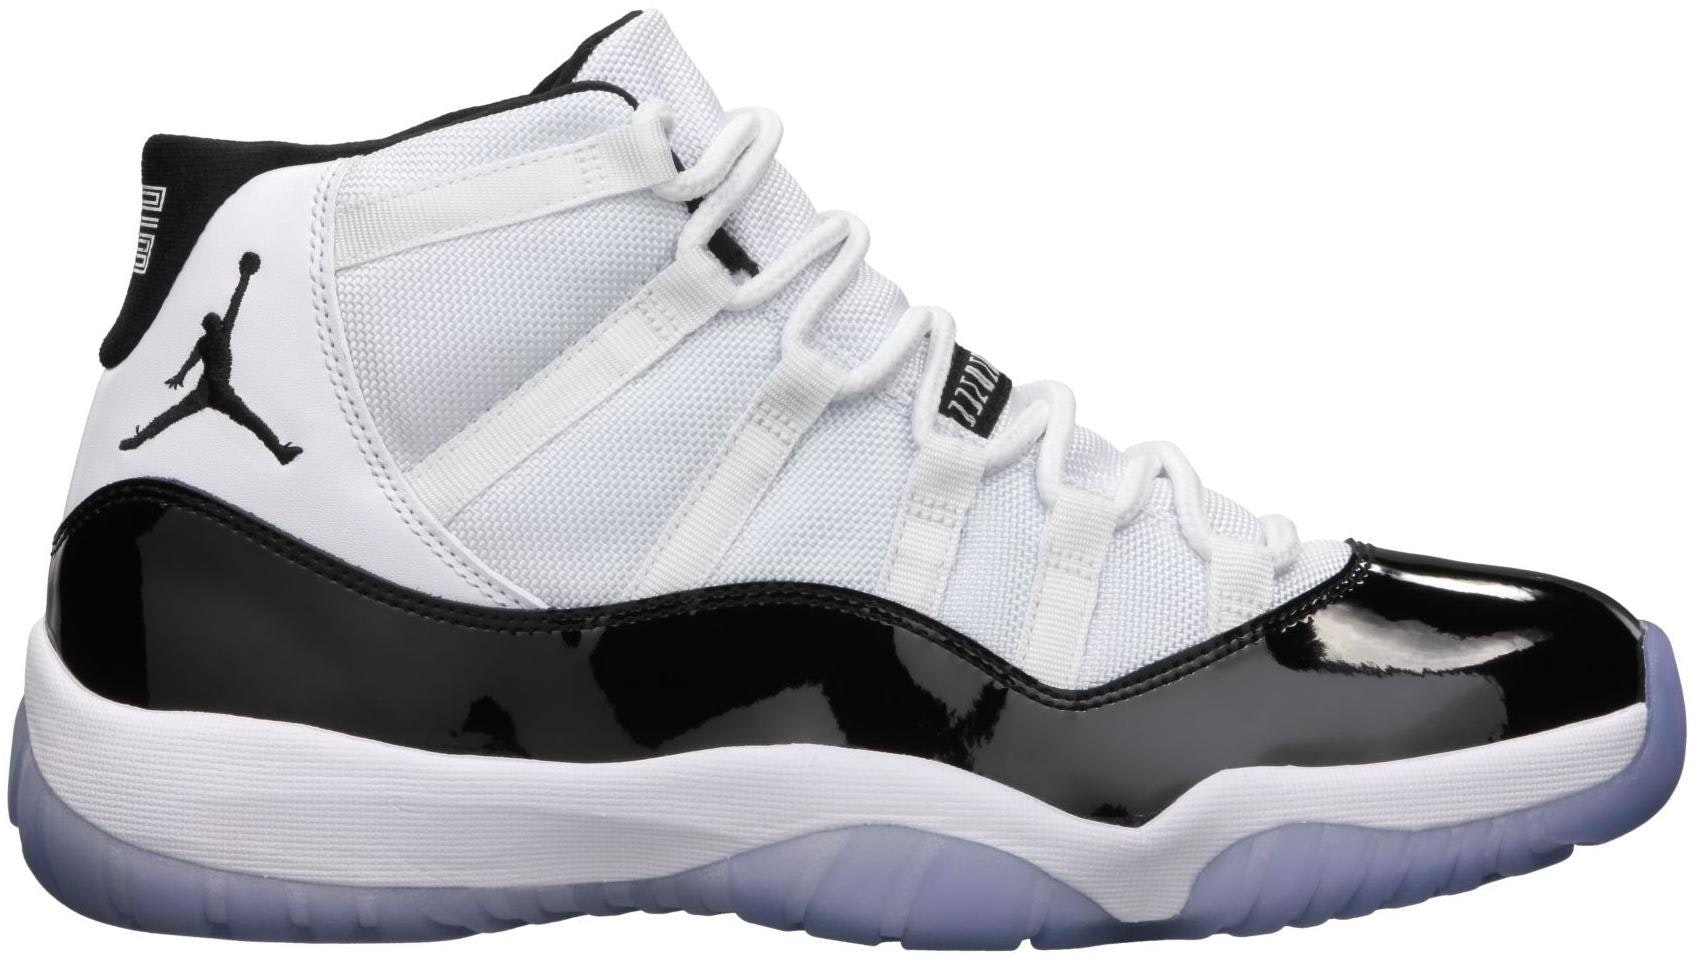 Jordan 11 Retro Concord (2011)